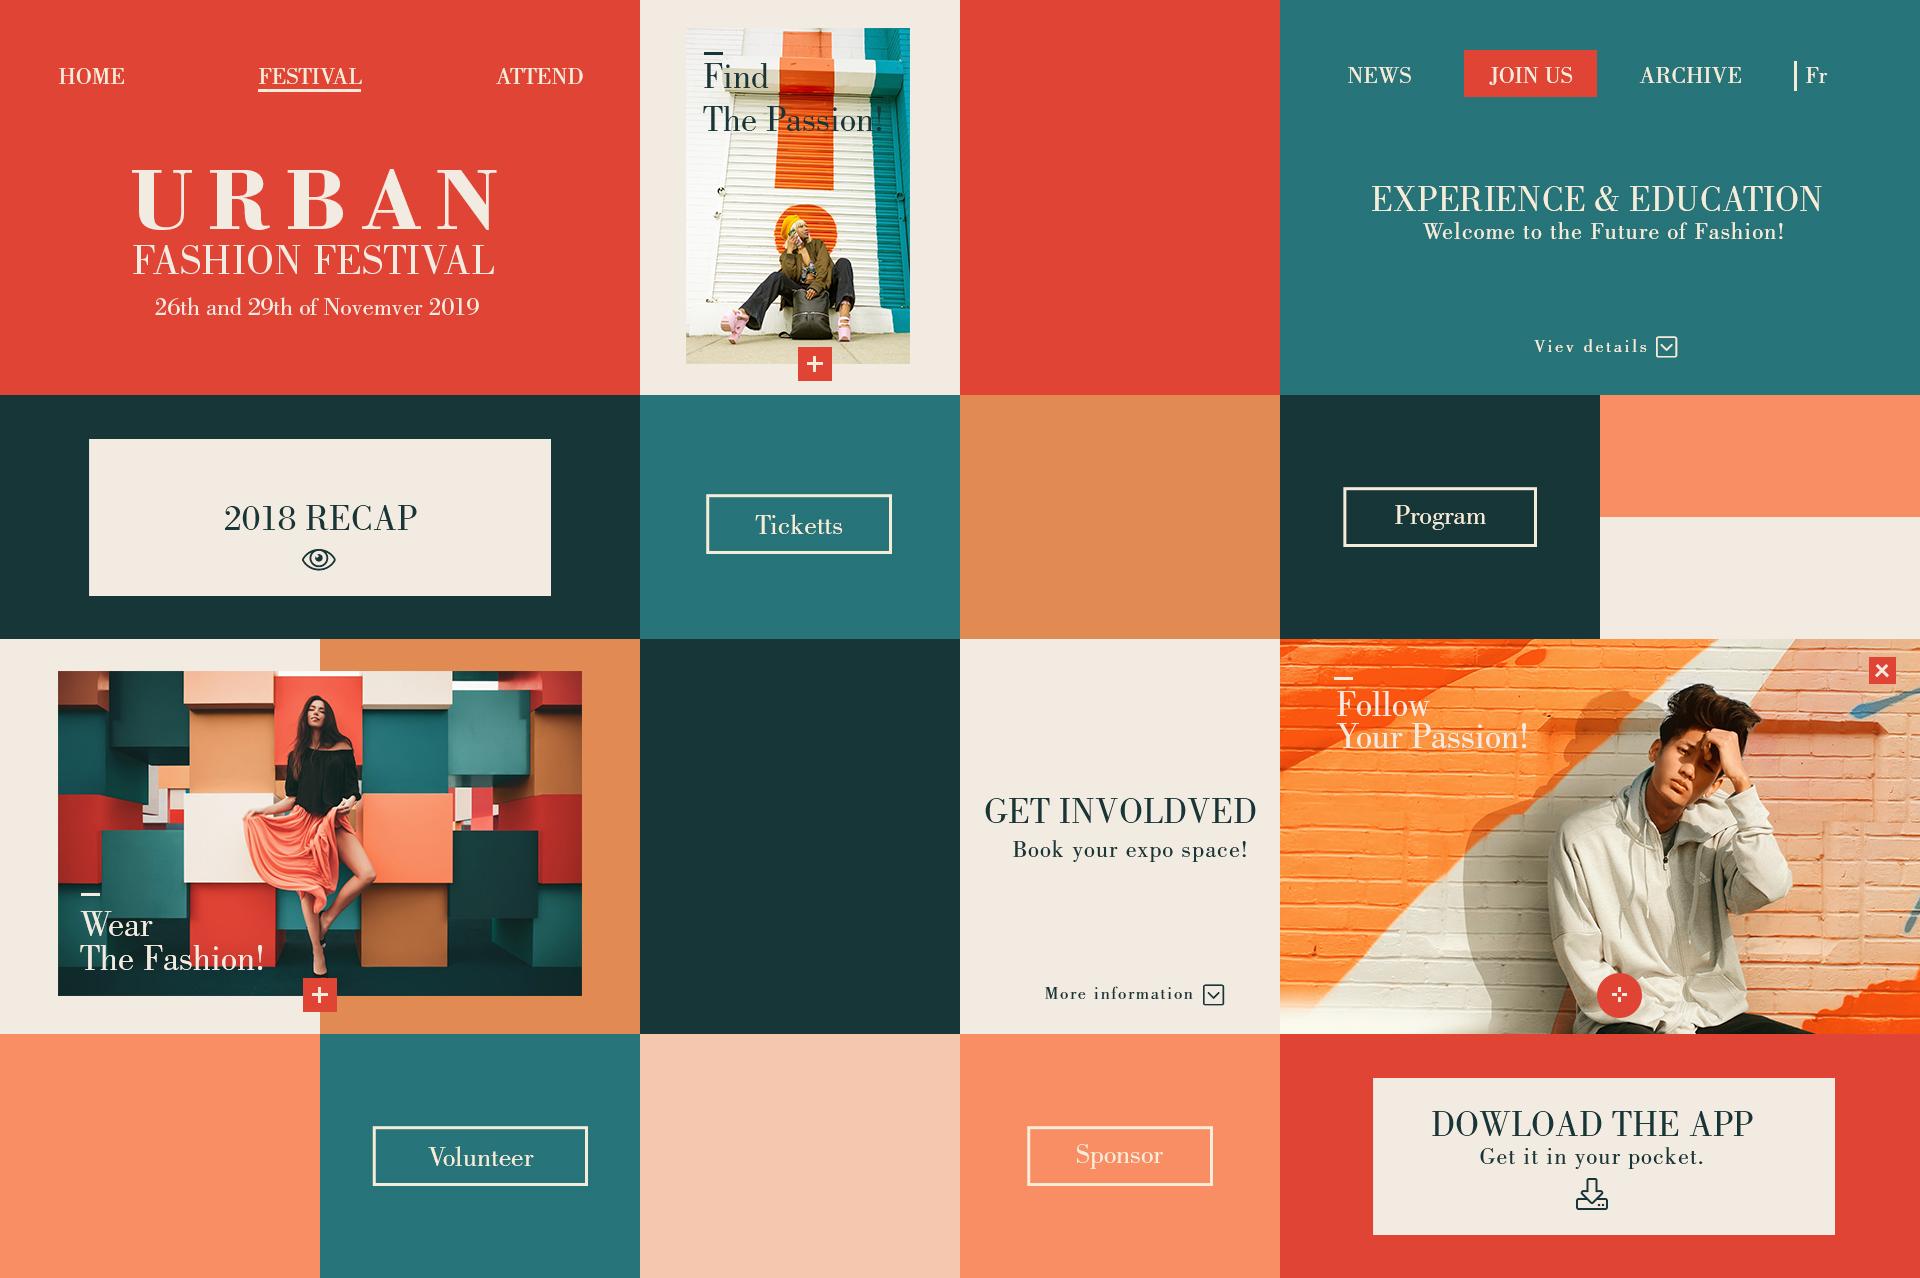 Urban fashion festival  webdesign concepts 015 19